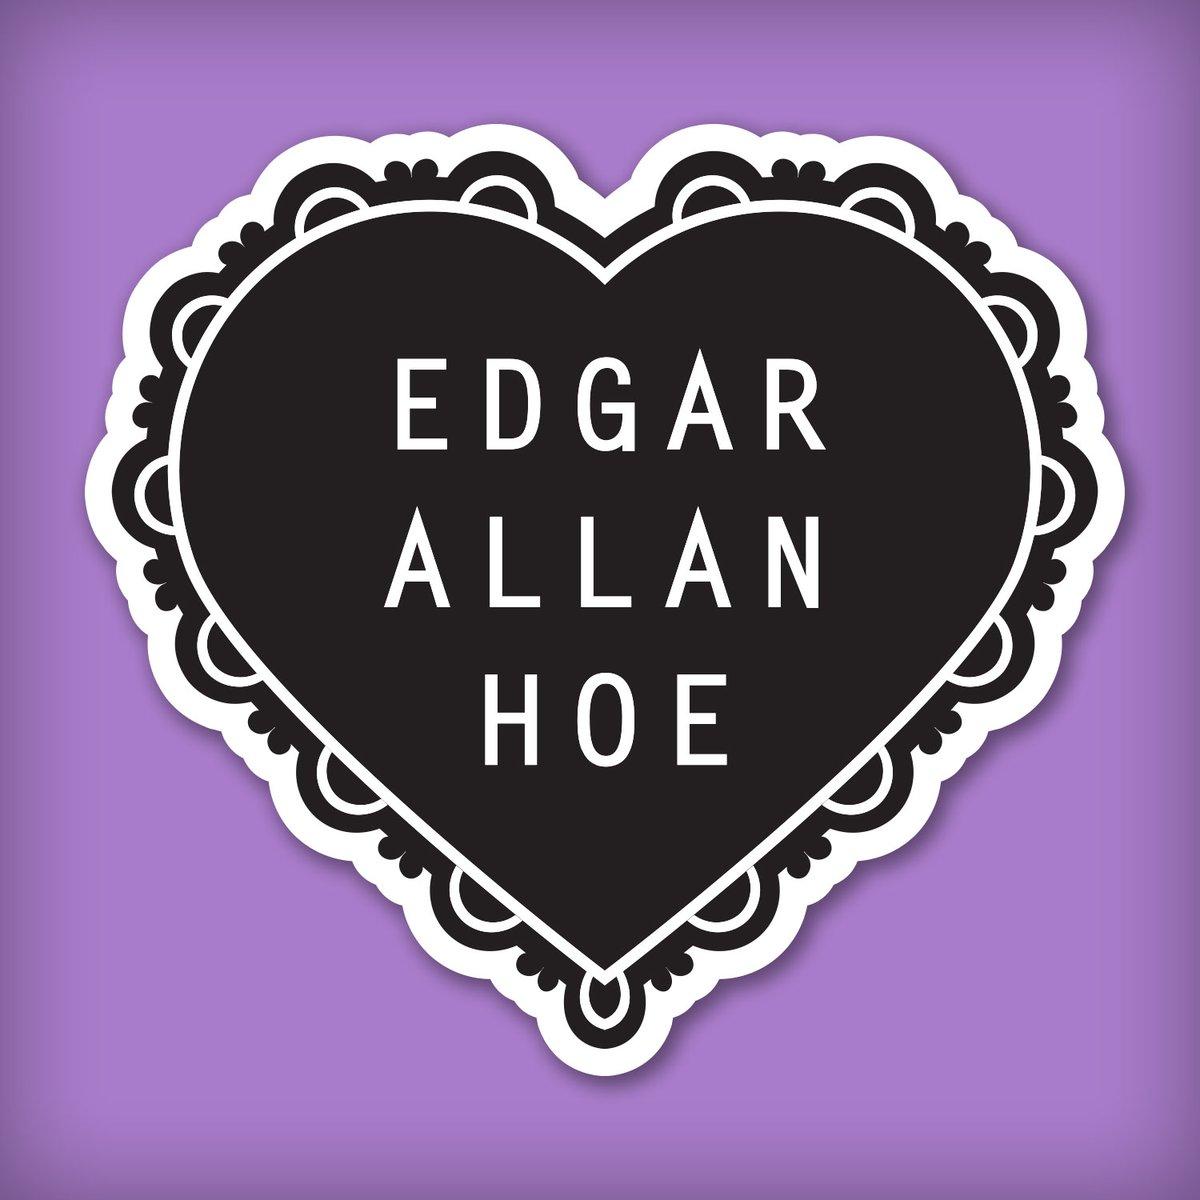 Image of Edgar Allan Hoe Sticker